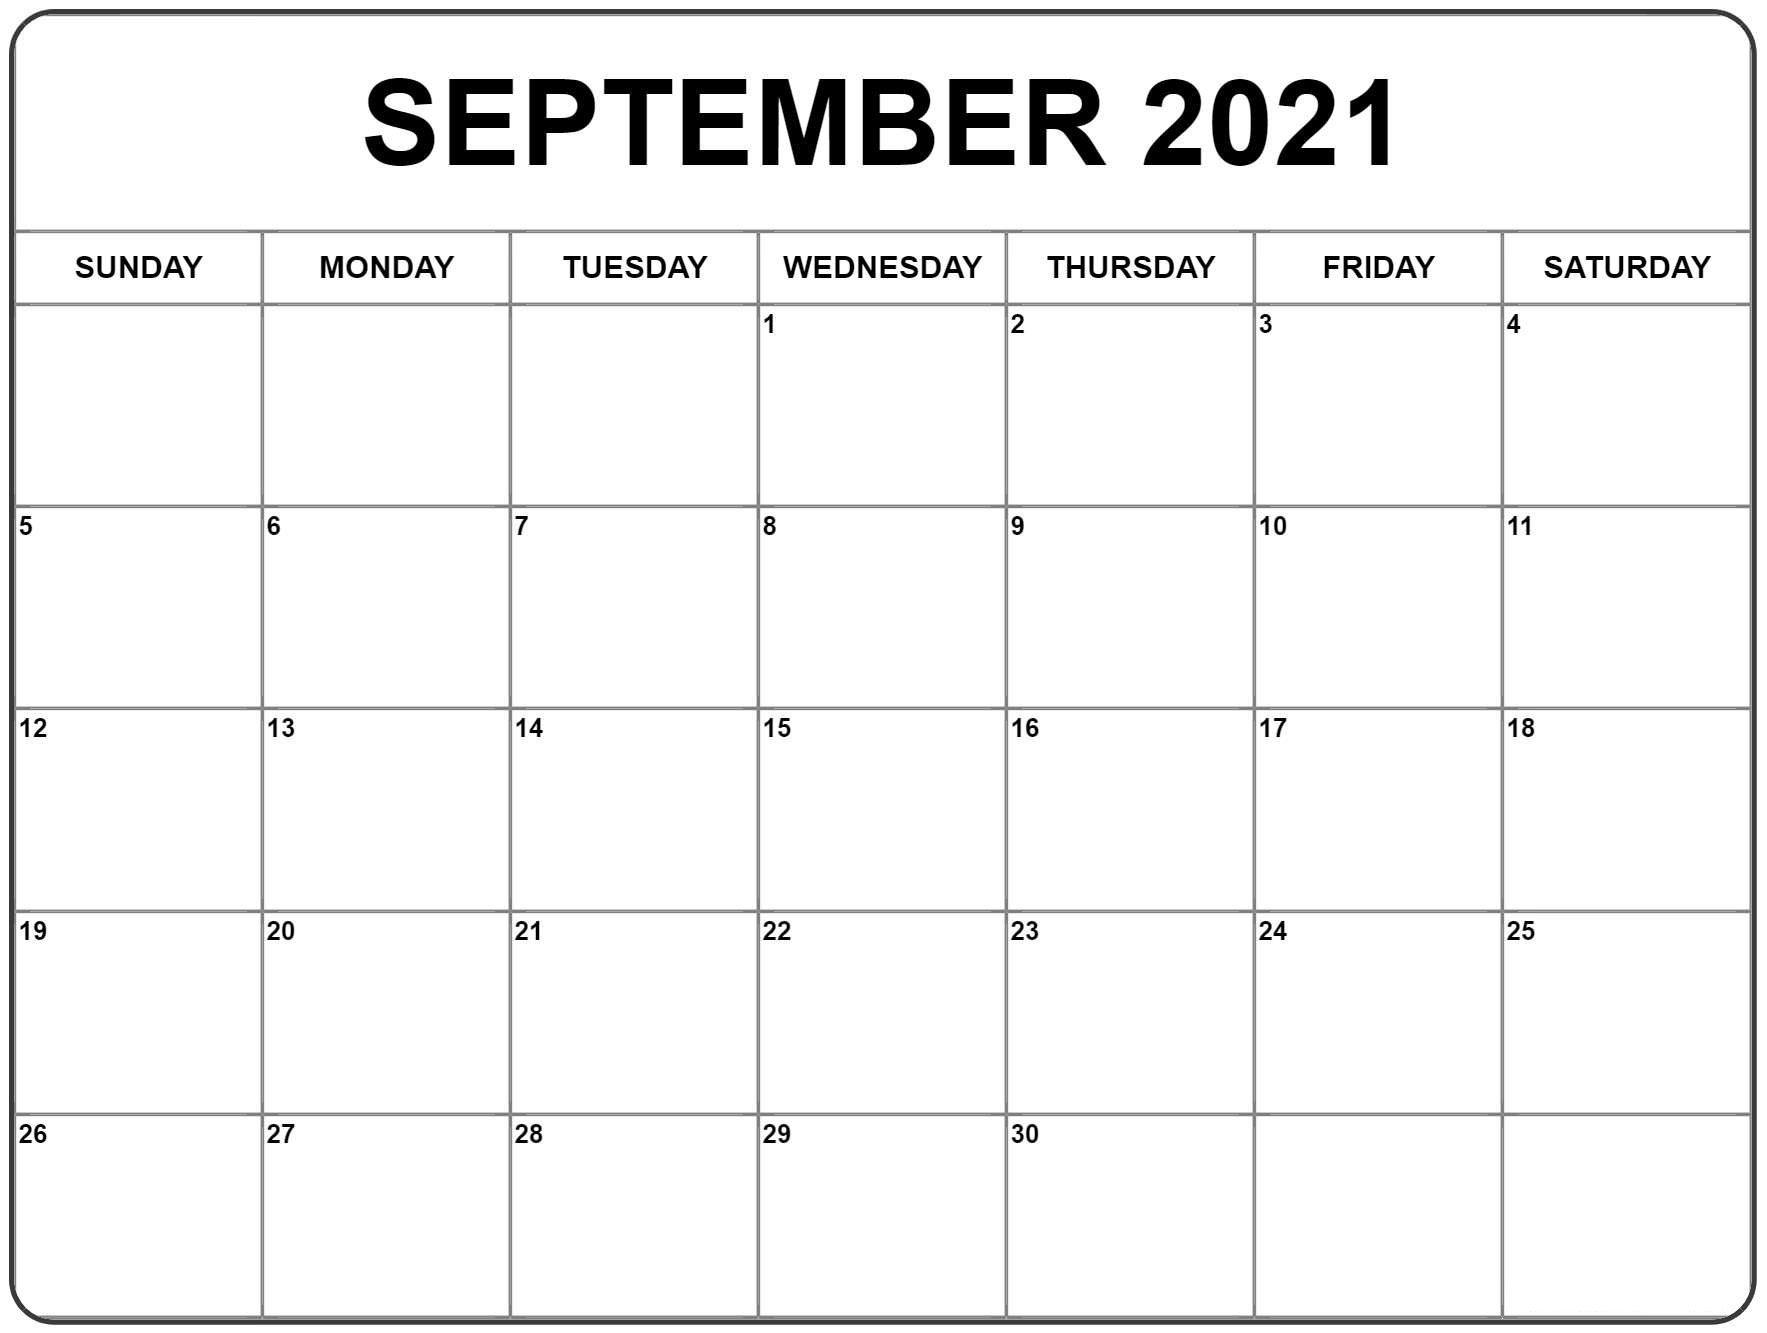 September 2021 Calendar | Monthly Calendar Printable, Free pertaining to September 2021 Calendar Printable